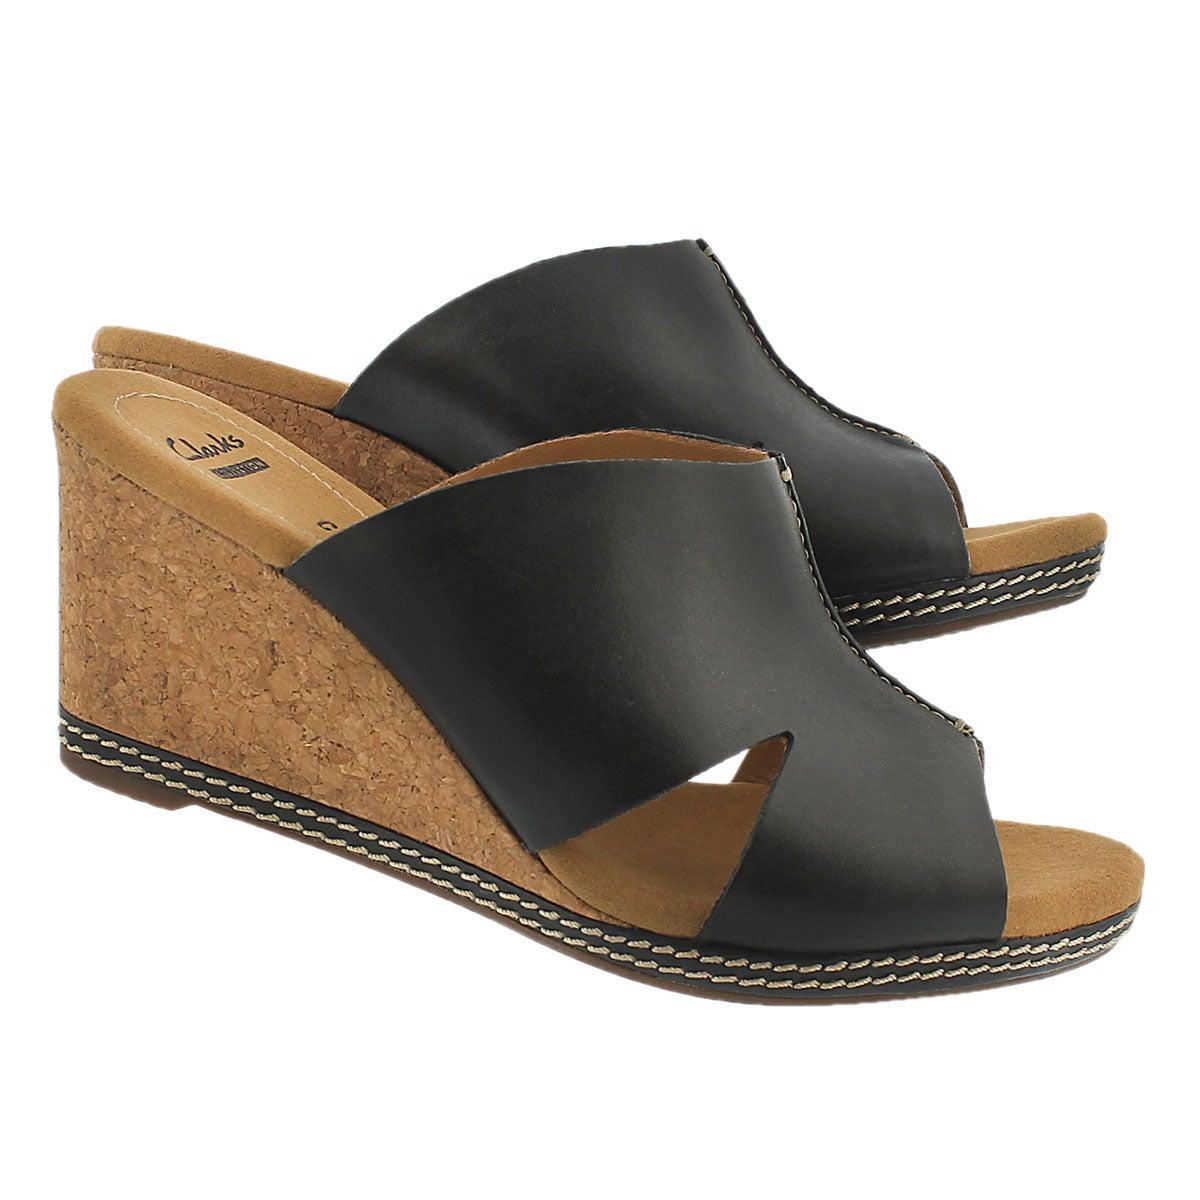 Sandale comp. Helio Island, noir, femmes